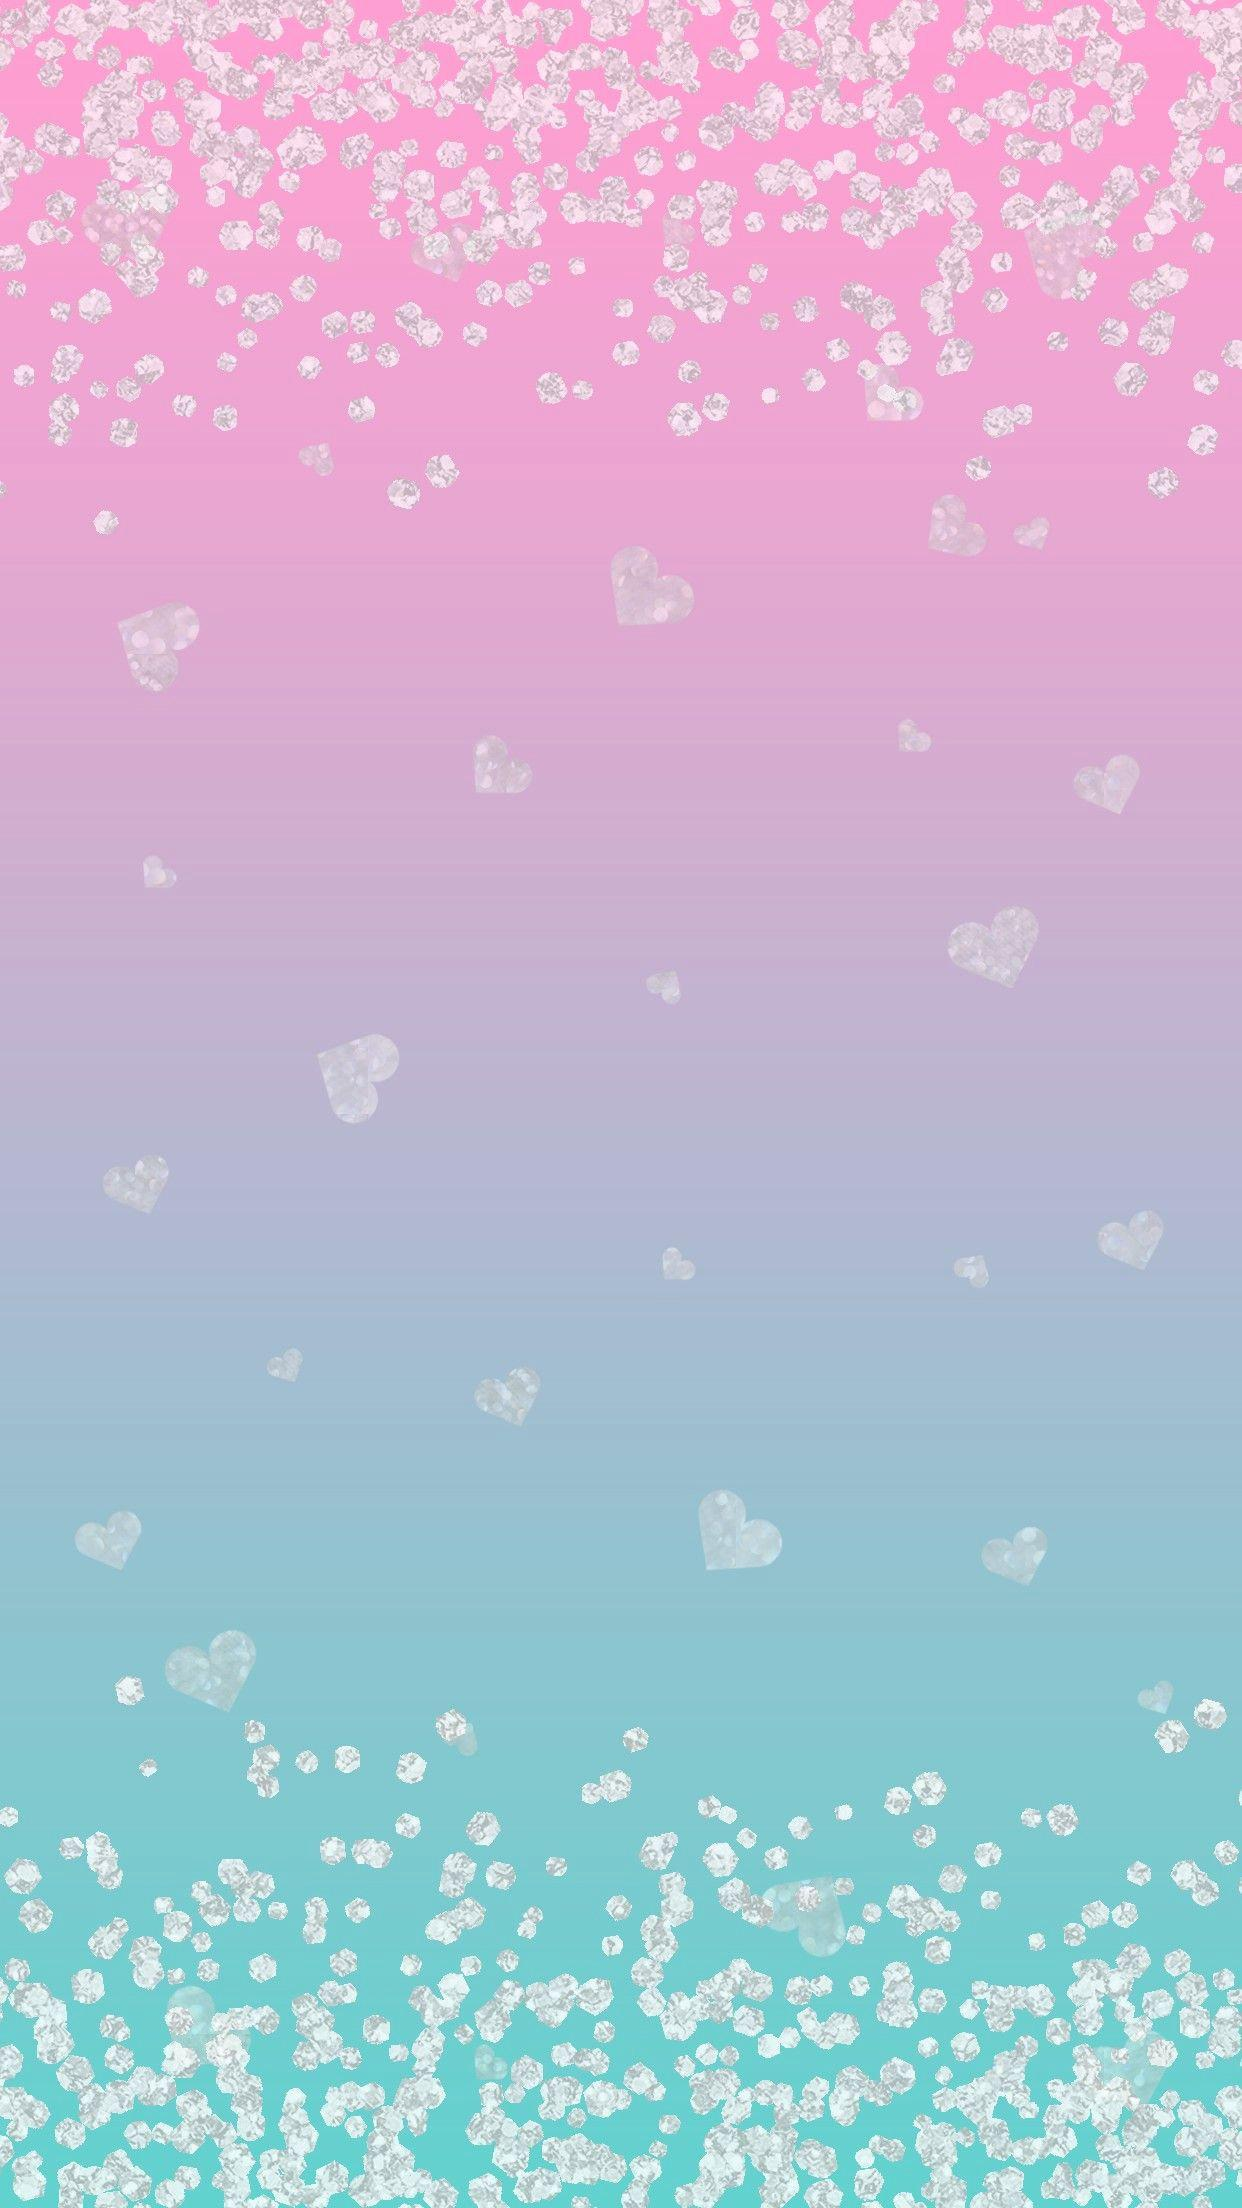 Cute Iphone Hd Wallpapers Wallpaper Cave